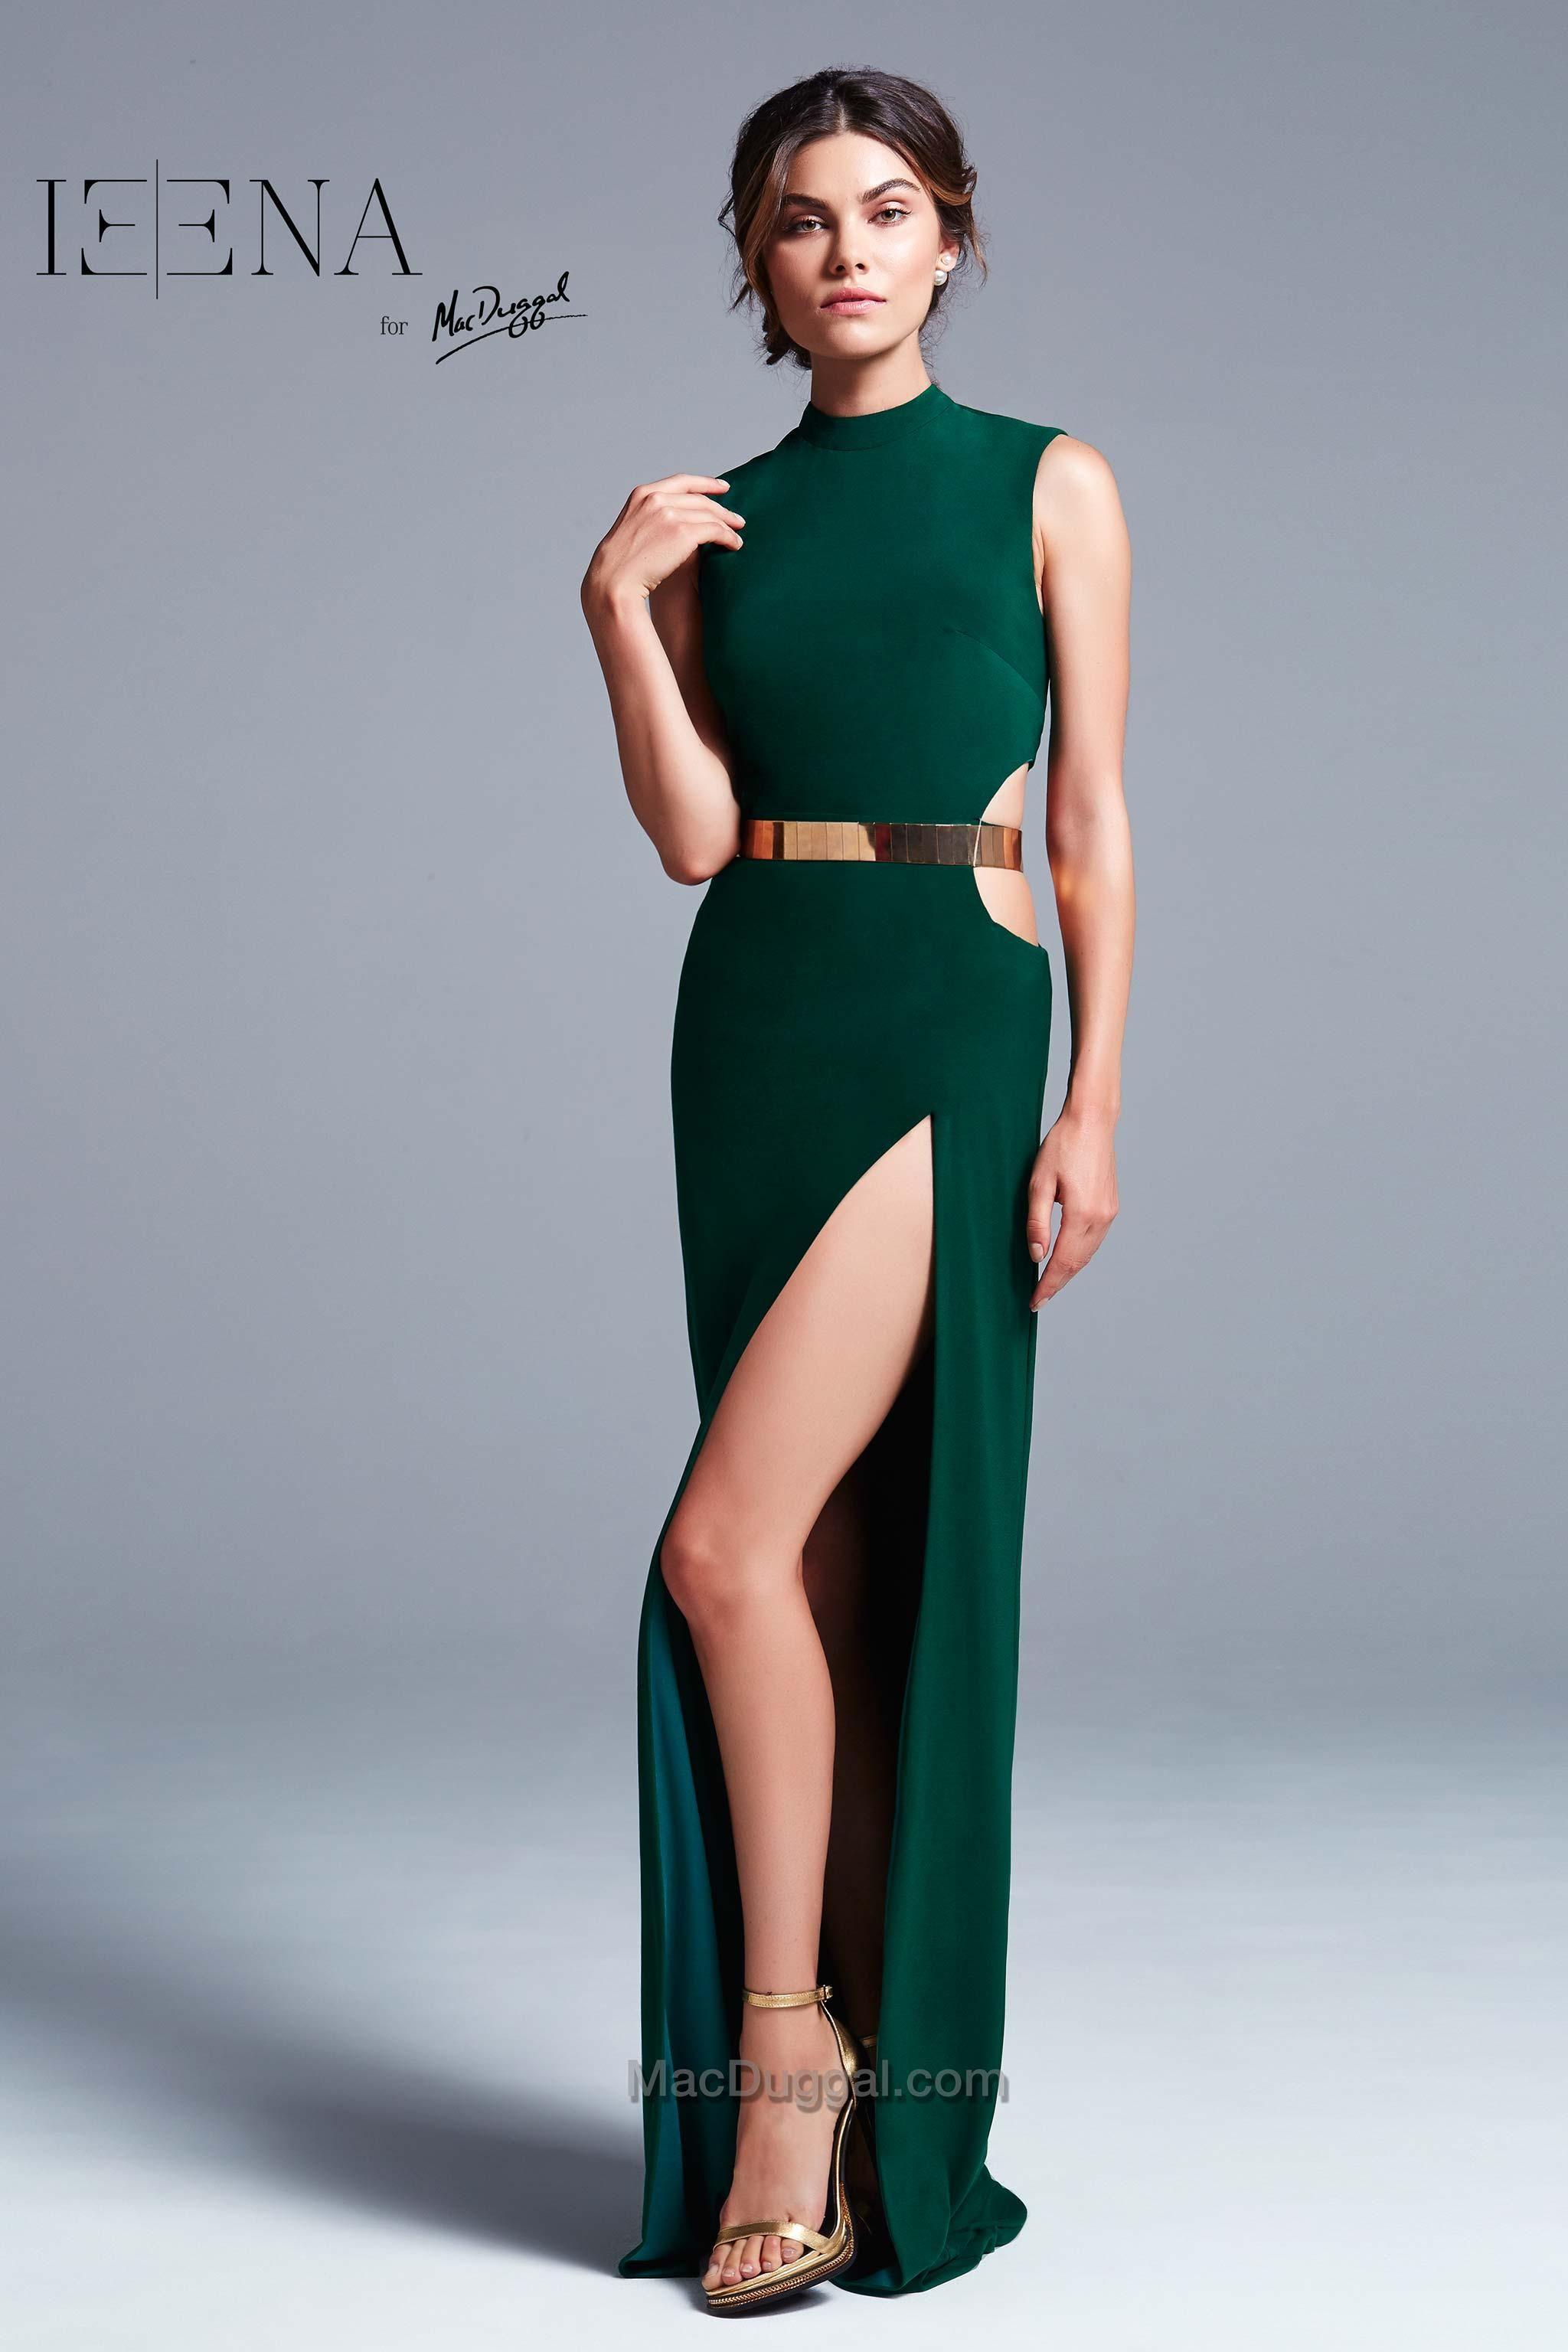 Ieena for mac duggan style emerald gown with high leg